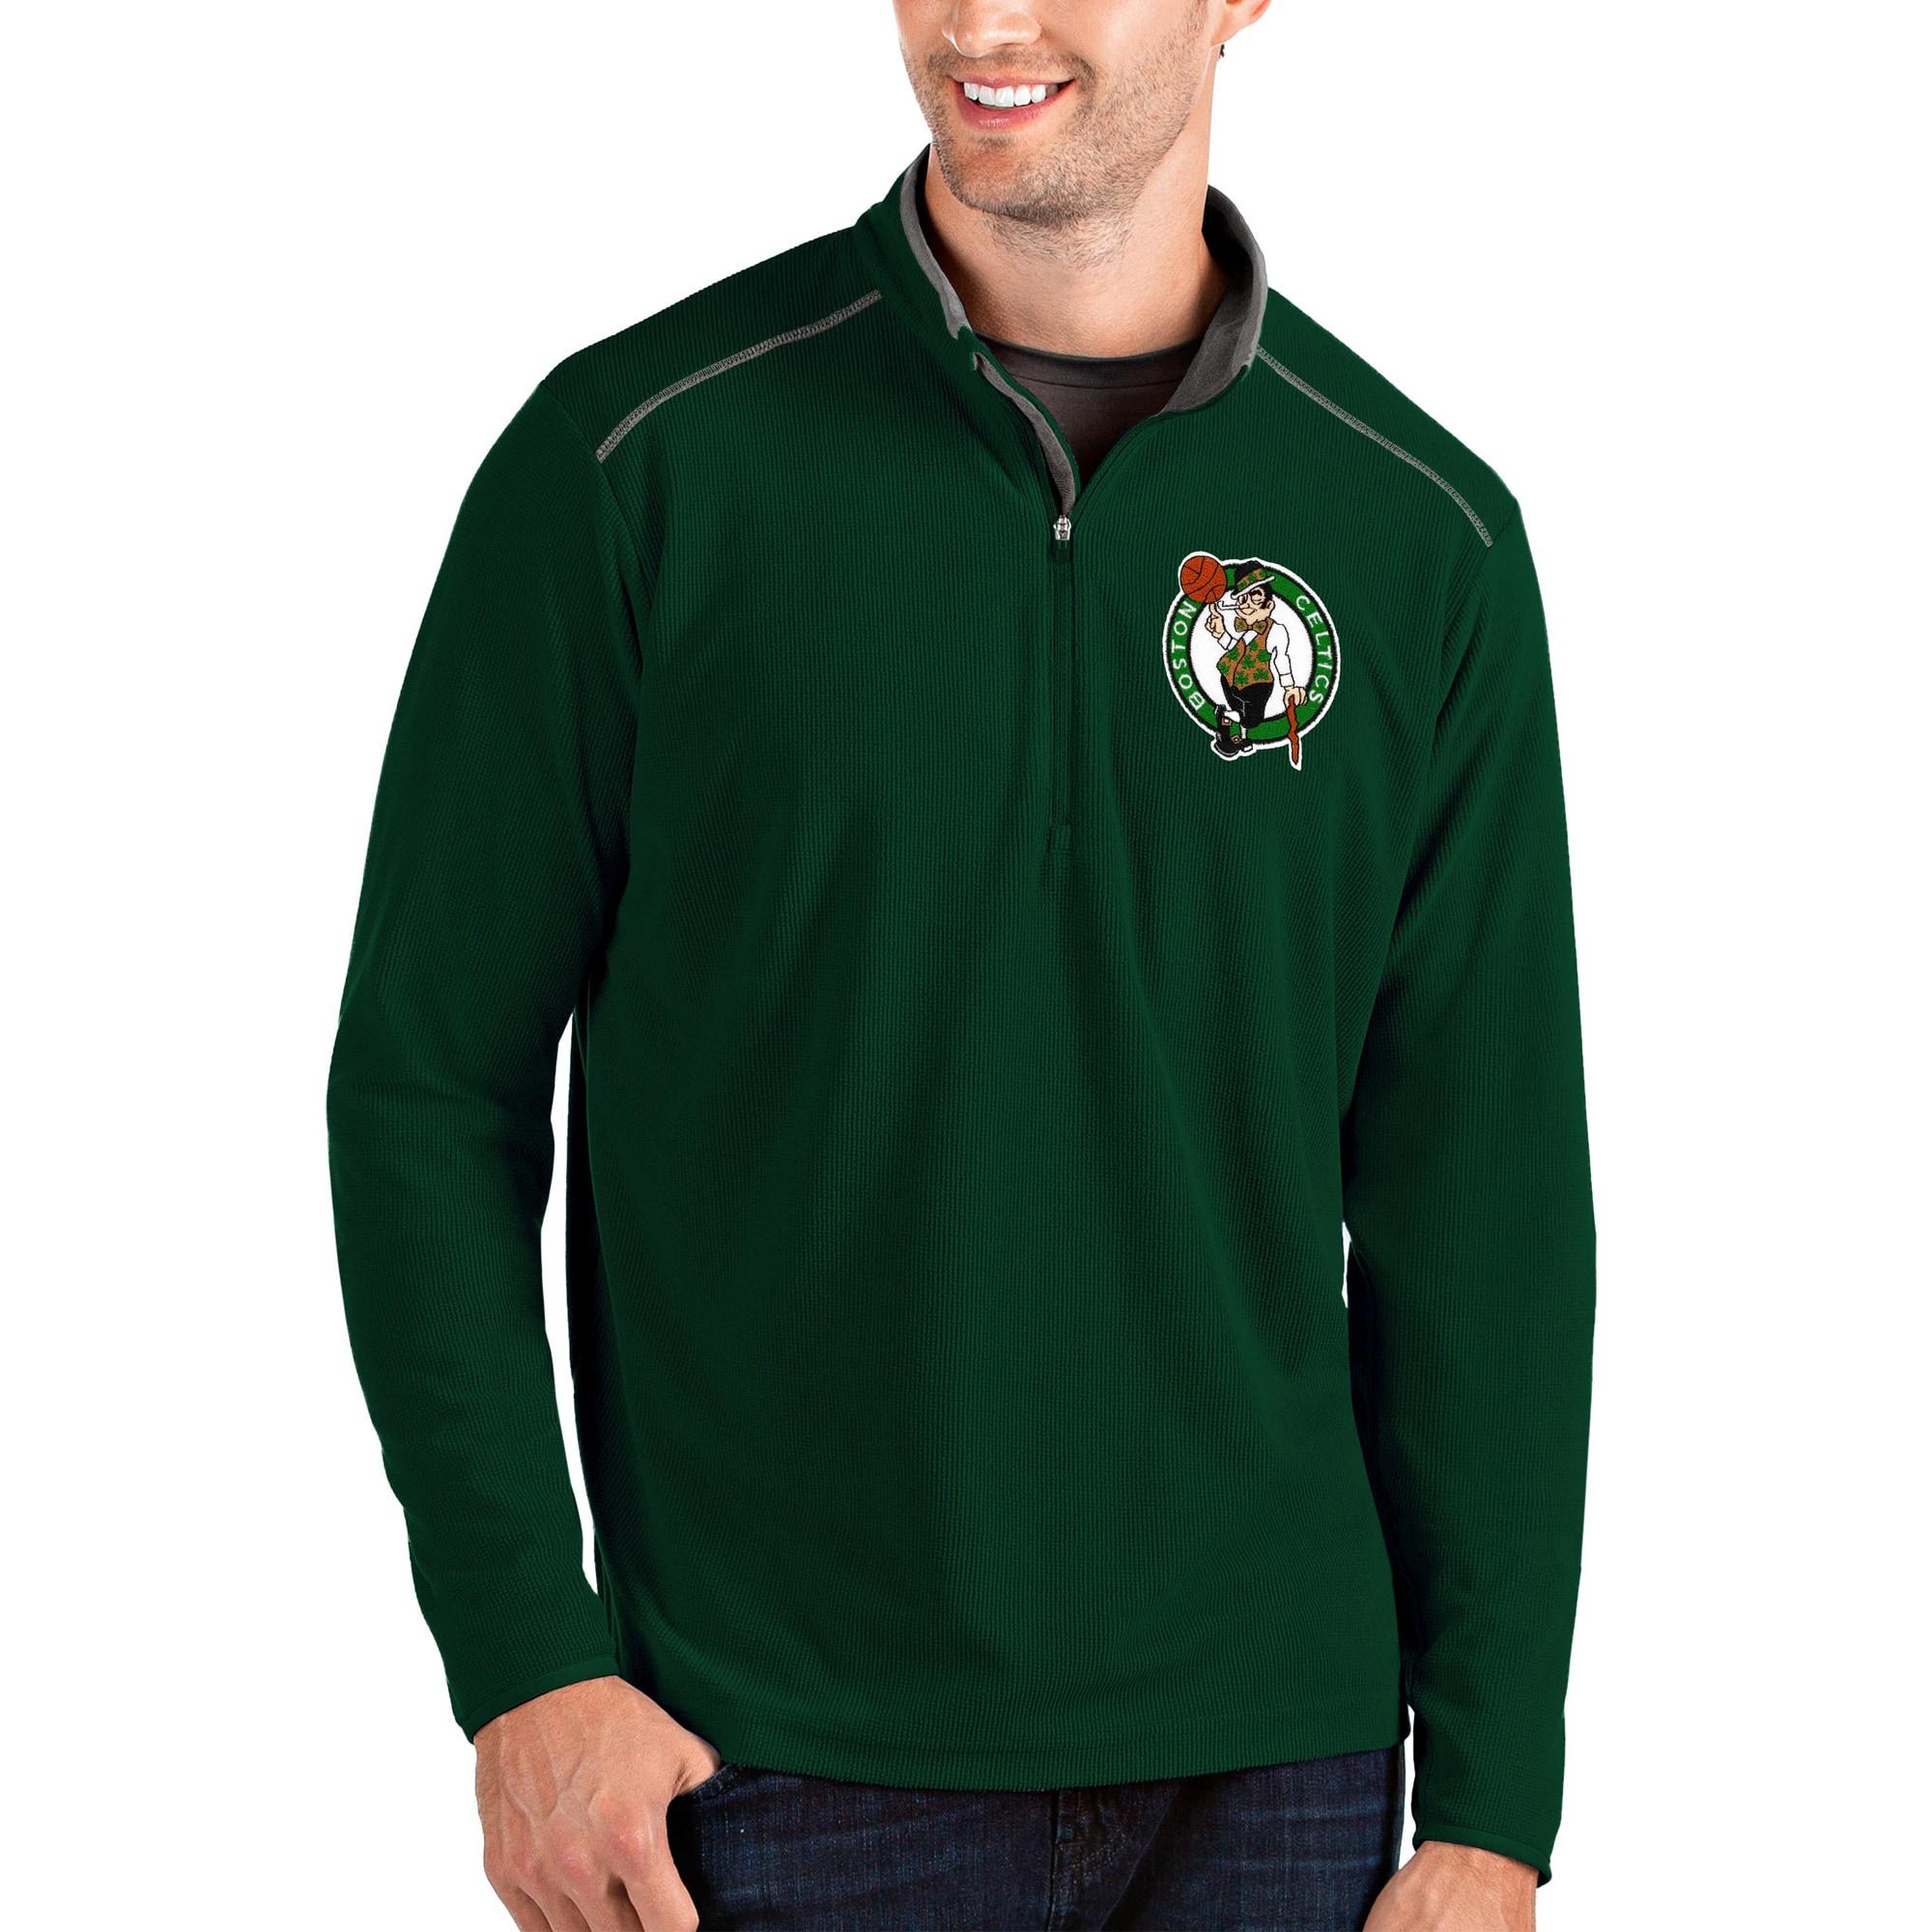 Boston Celtics Antigua Glacier Quarter-Zip Pullover Jacket - Green/Gray